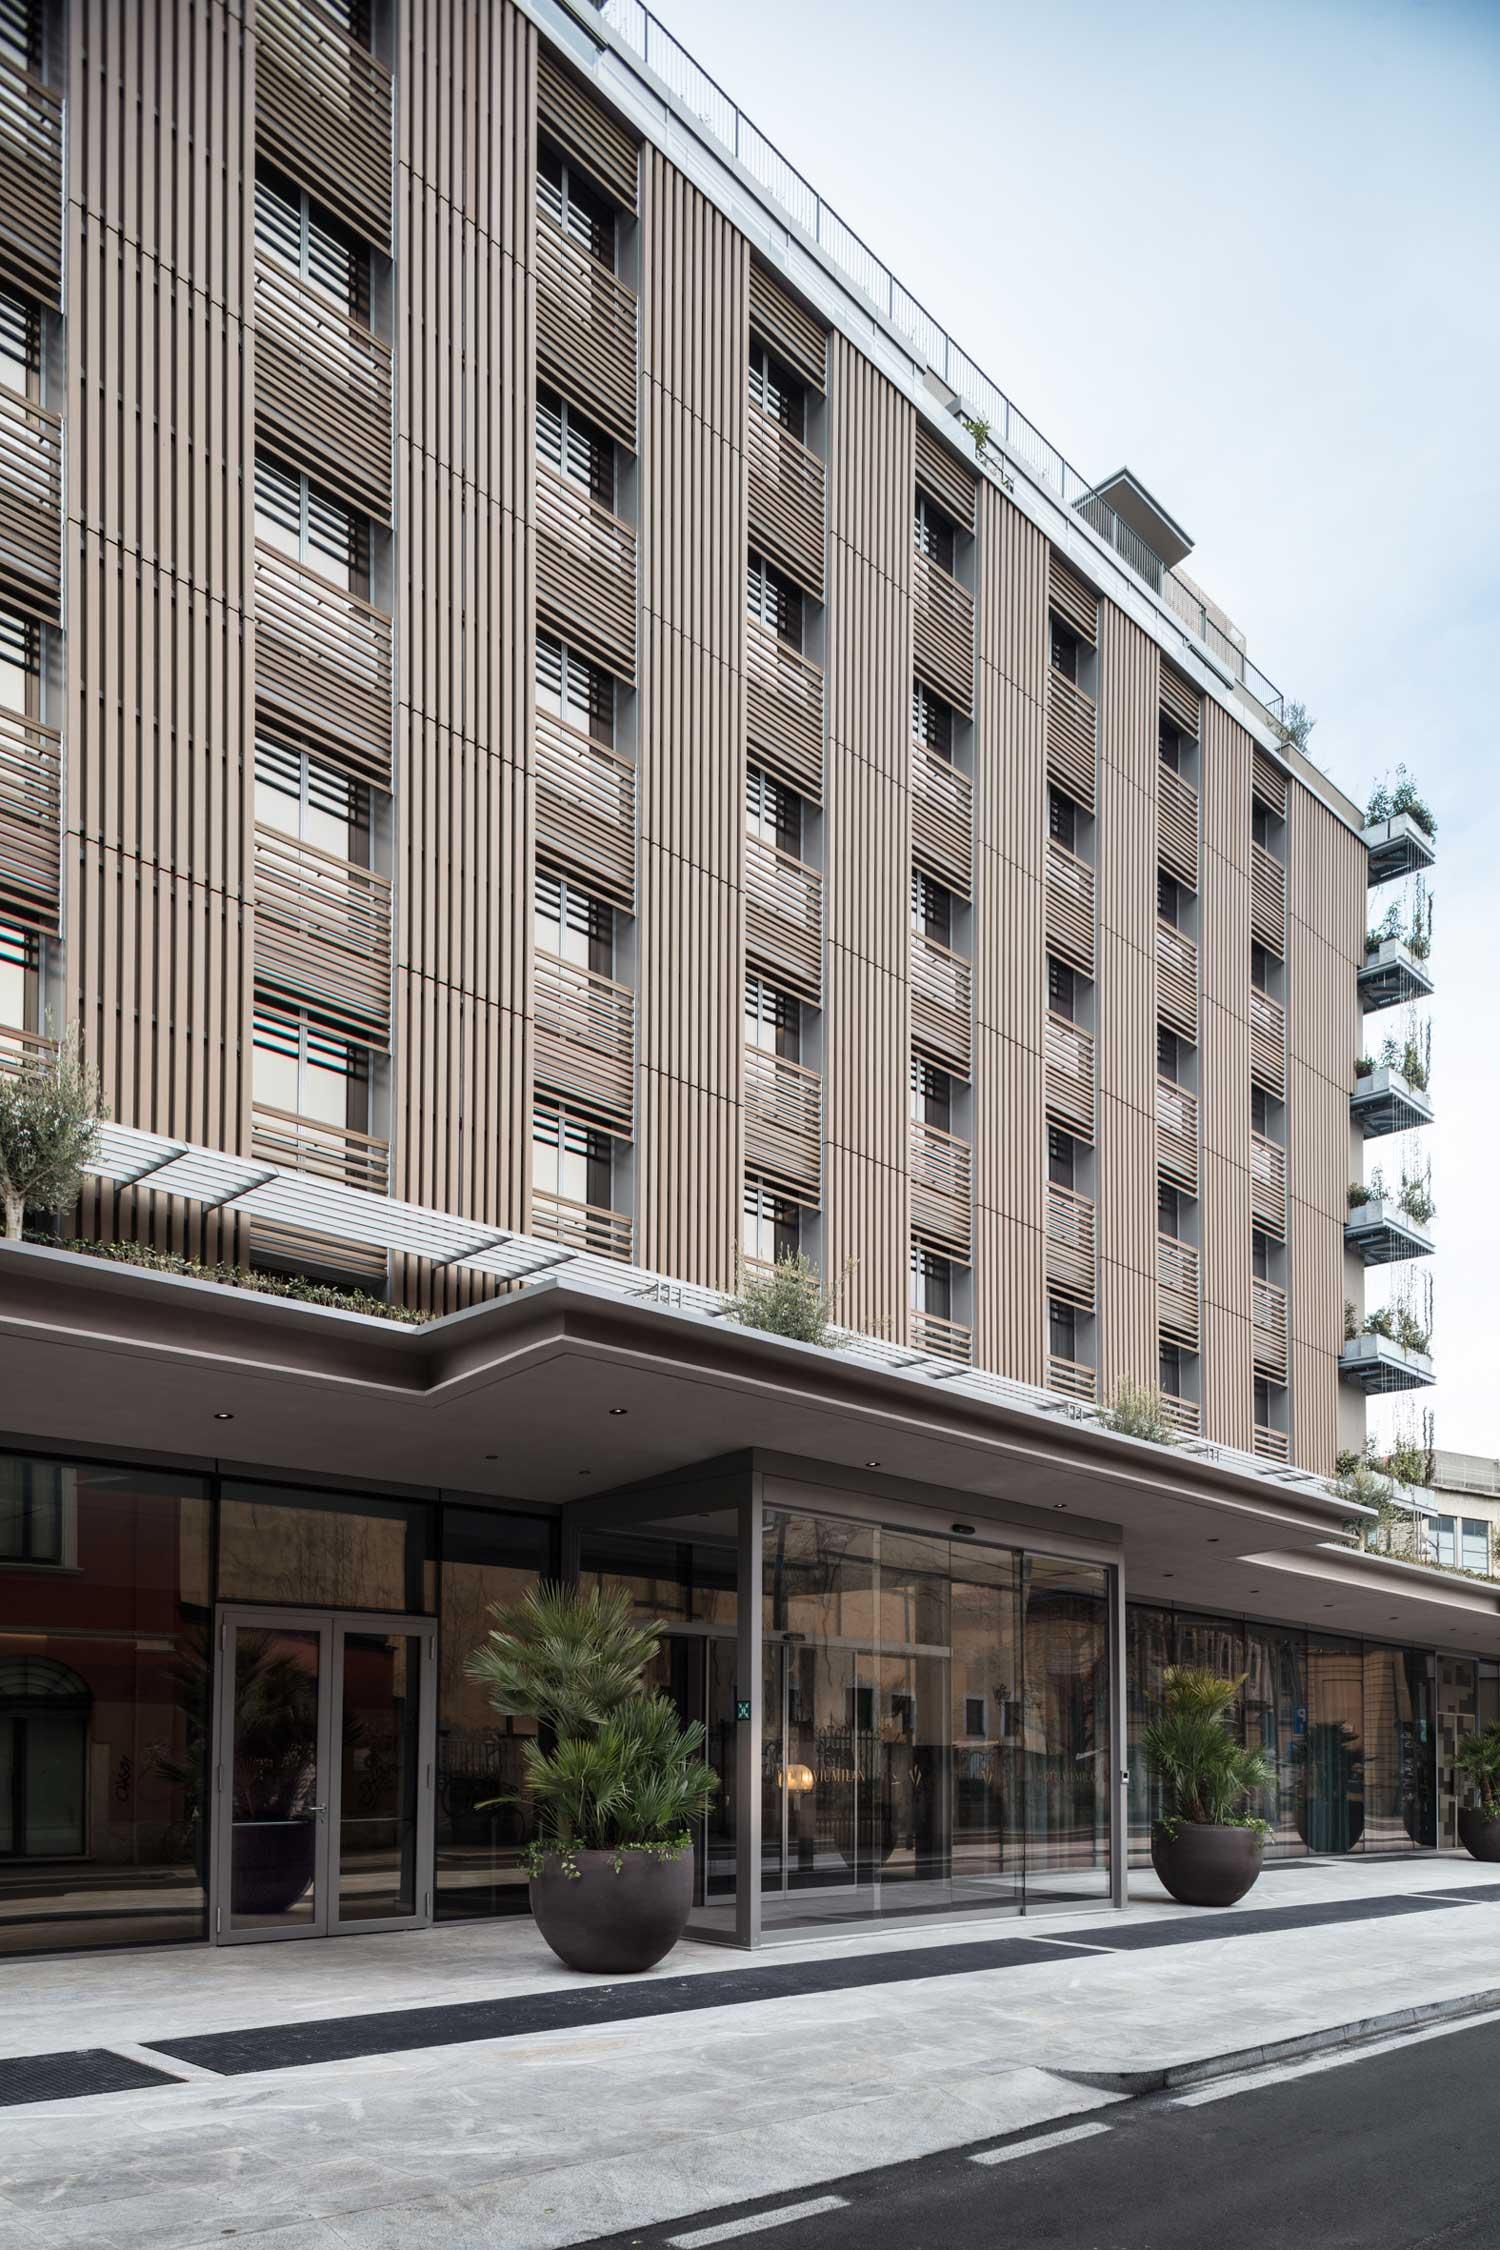 Milantrace2017 Hotel VIU Milan by Arassociati and interiors by Nicola Gallizia | Yellowtrace